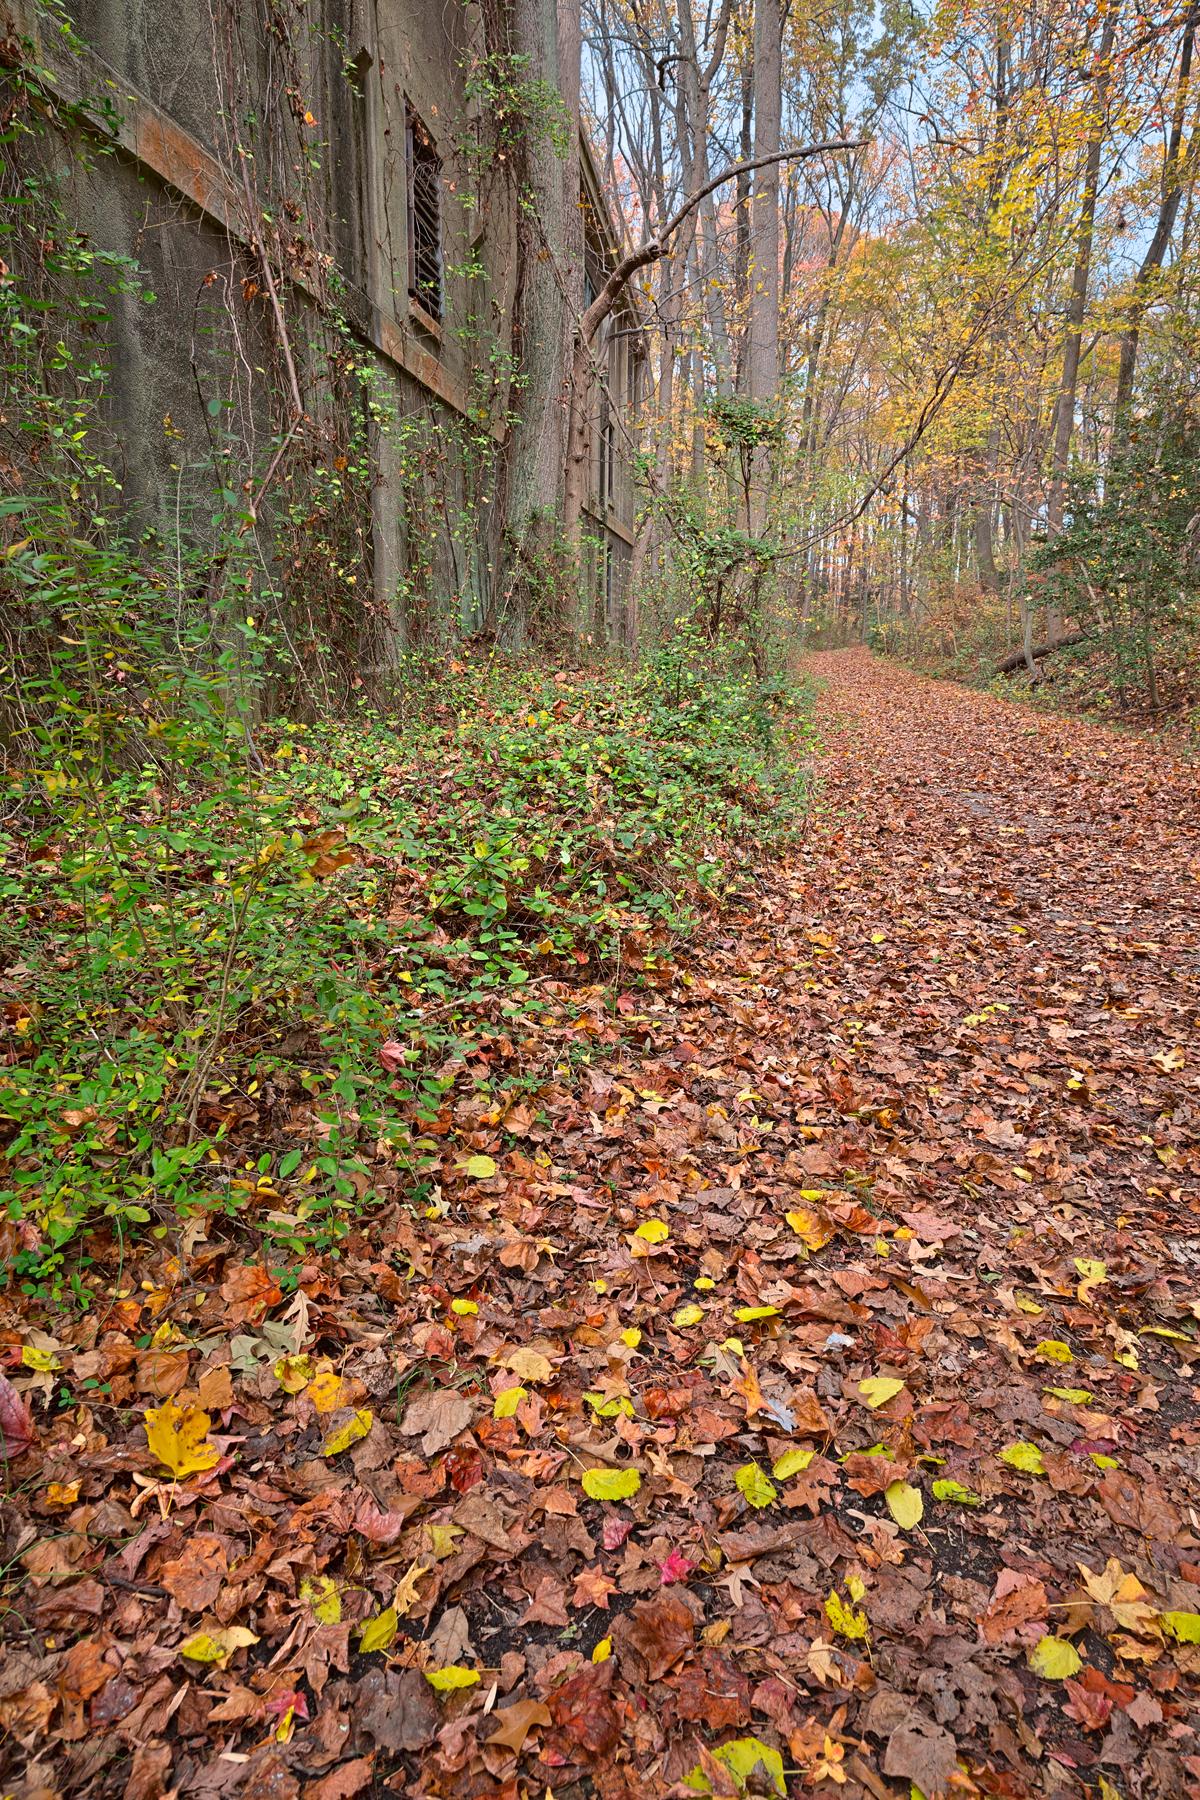 Fall power house trail - hdr photo